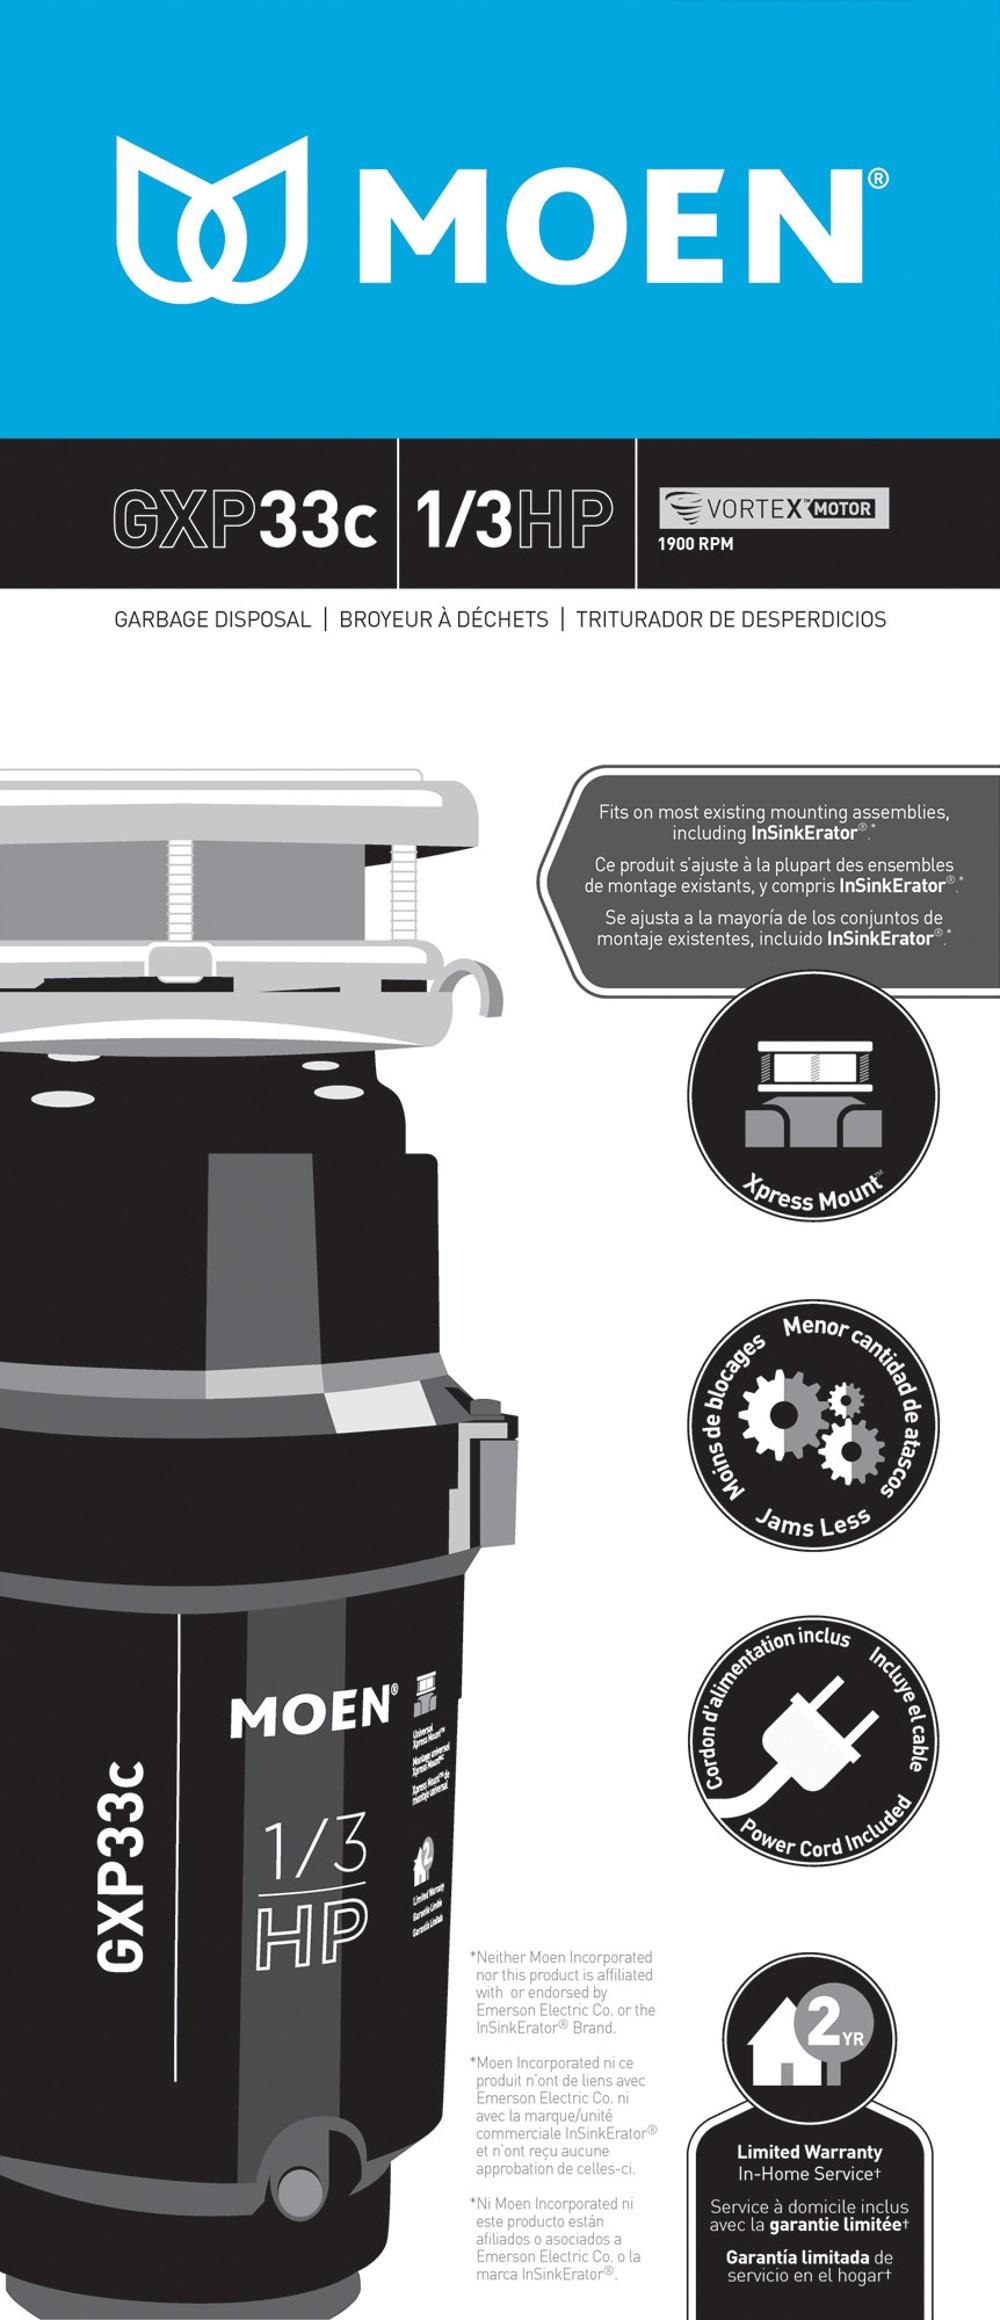 Model: GXP33C | Moen GX PRO Series 1/3 Horsepower Garbage Disposal